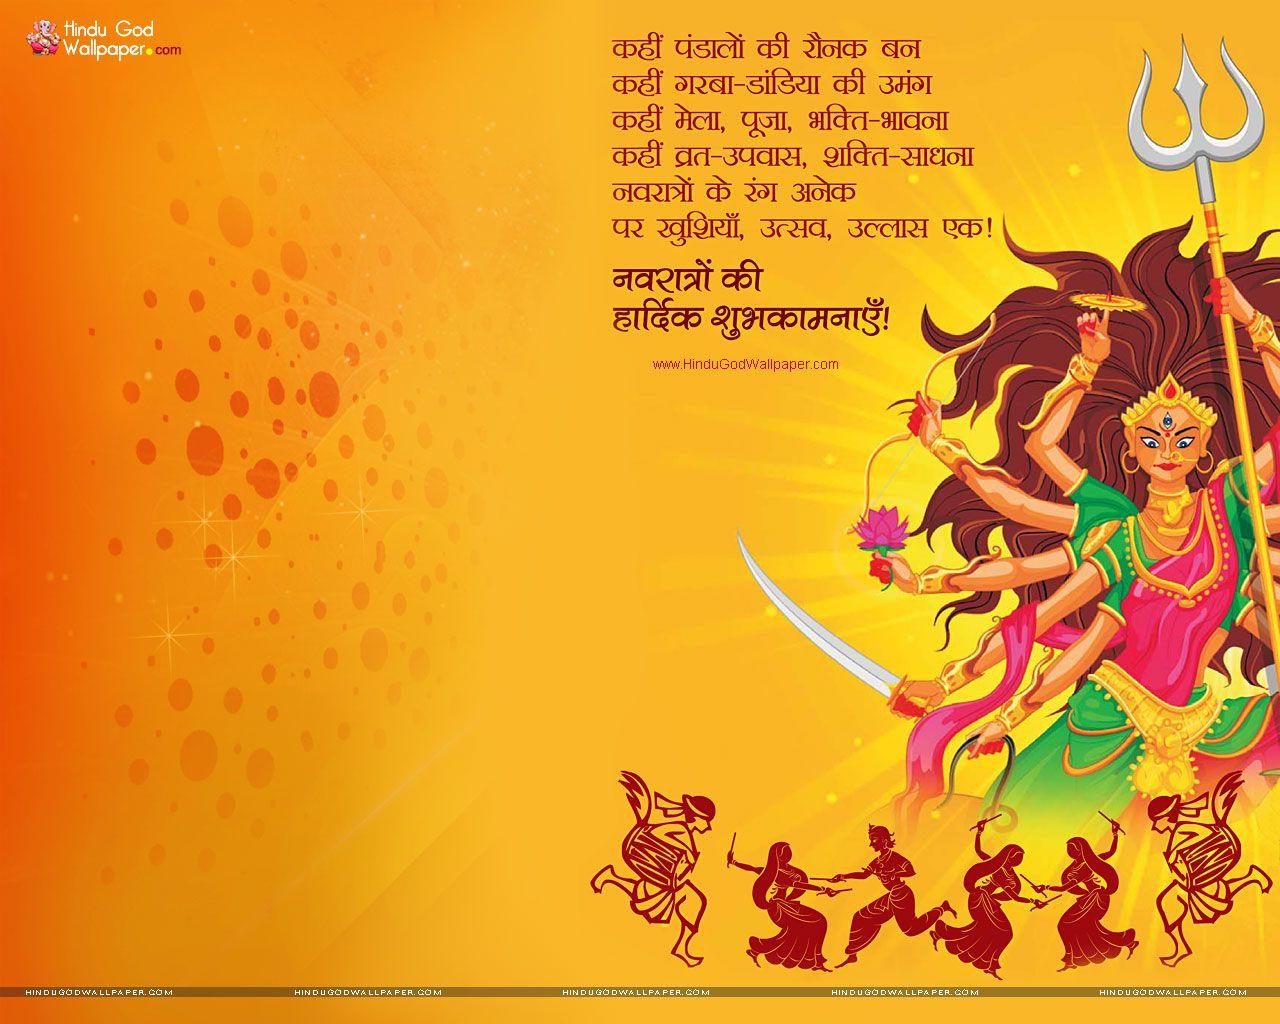 Wallpaper download navratri - Happy Navratri Hd Wallpaper With Quotes Download